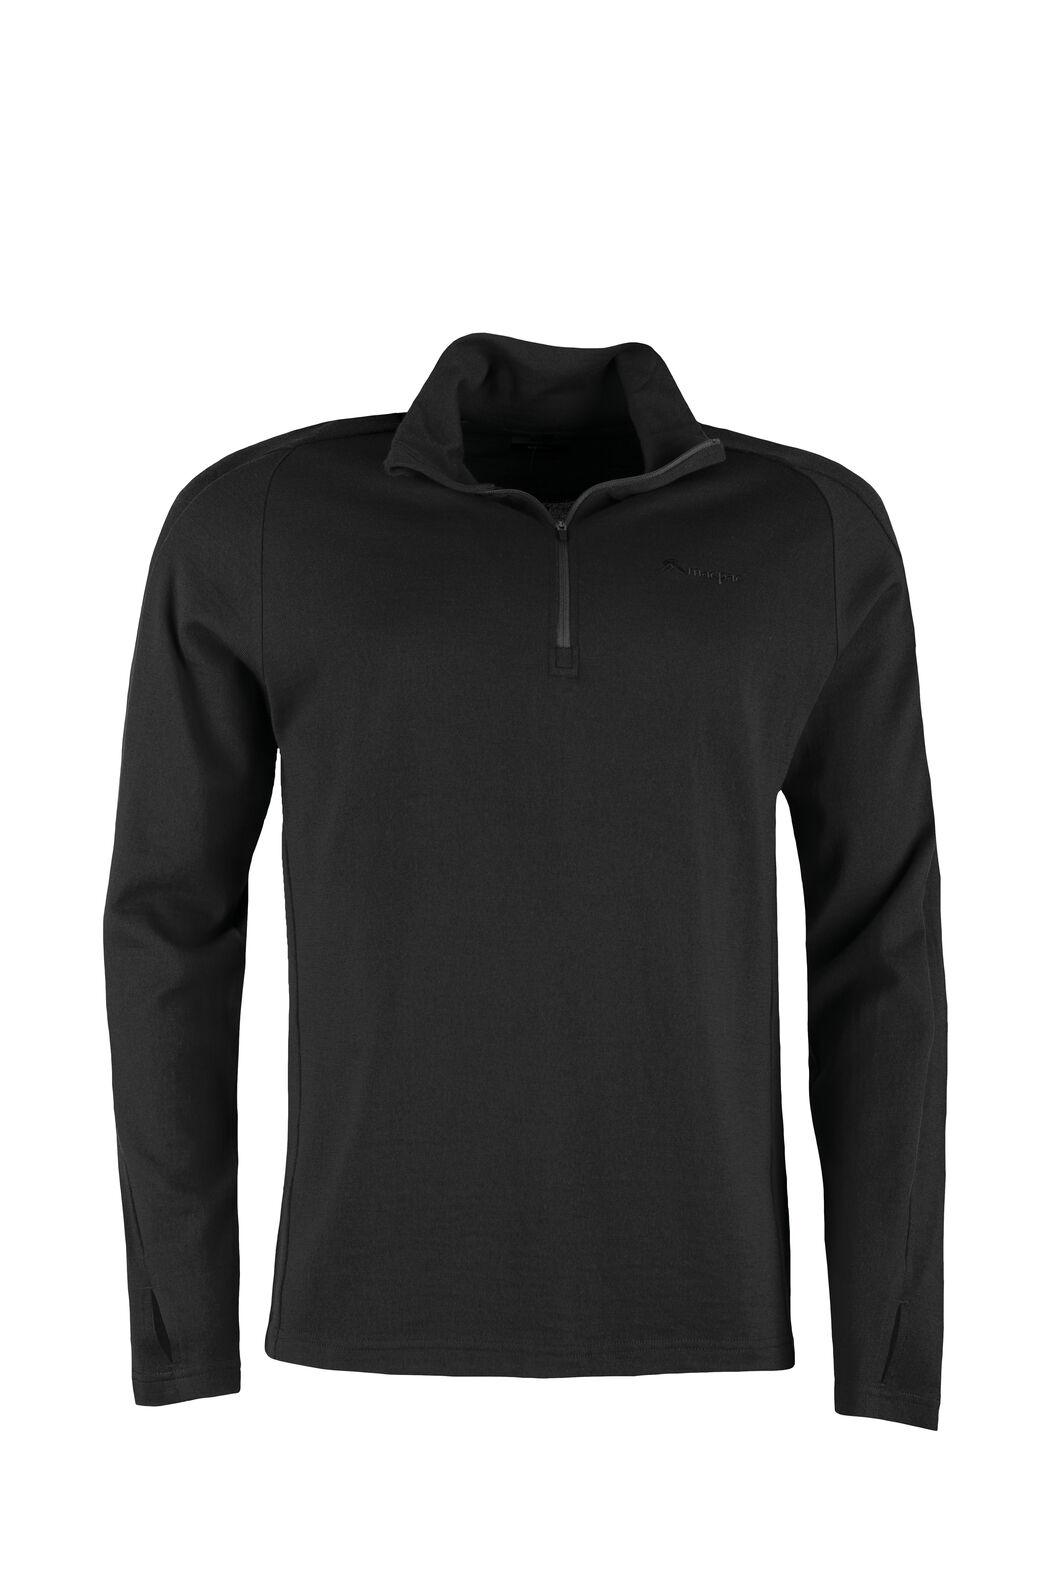 Macpac Kauri 280 Merino Pullover — Men's, Black, hi-res